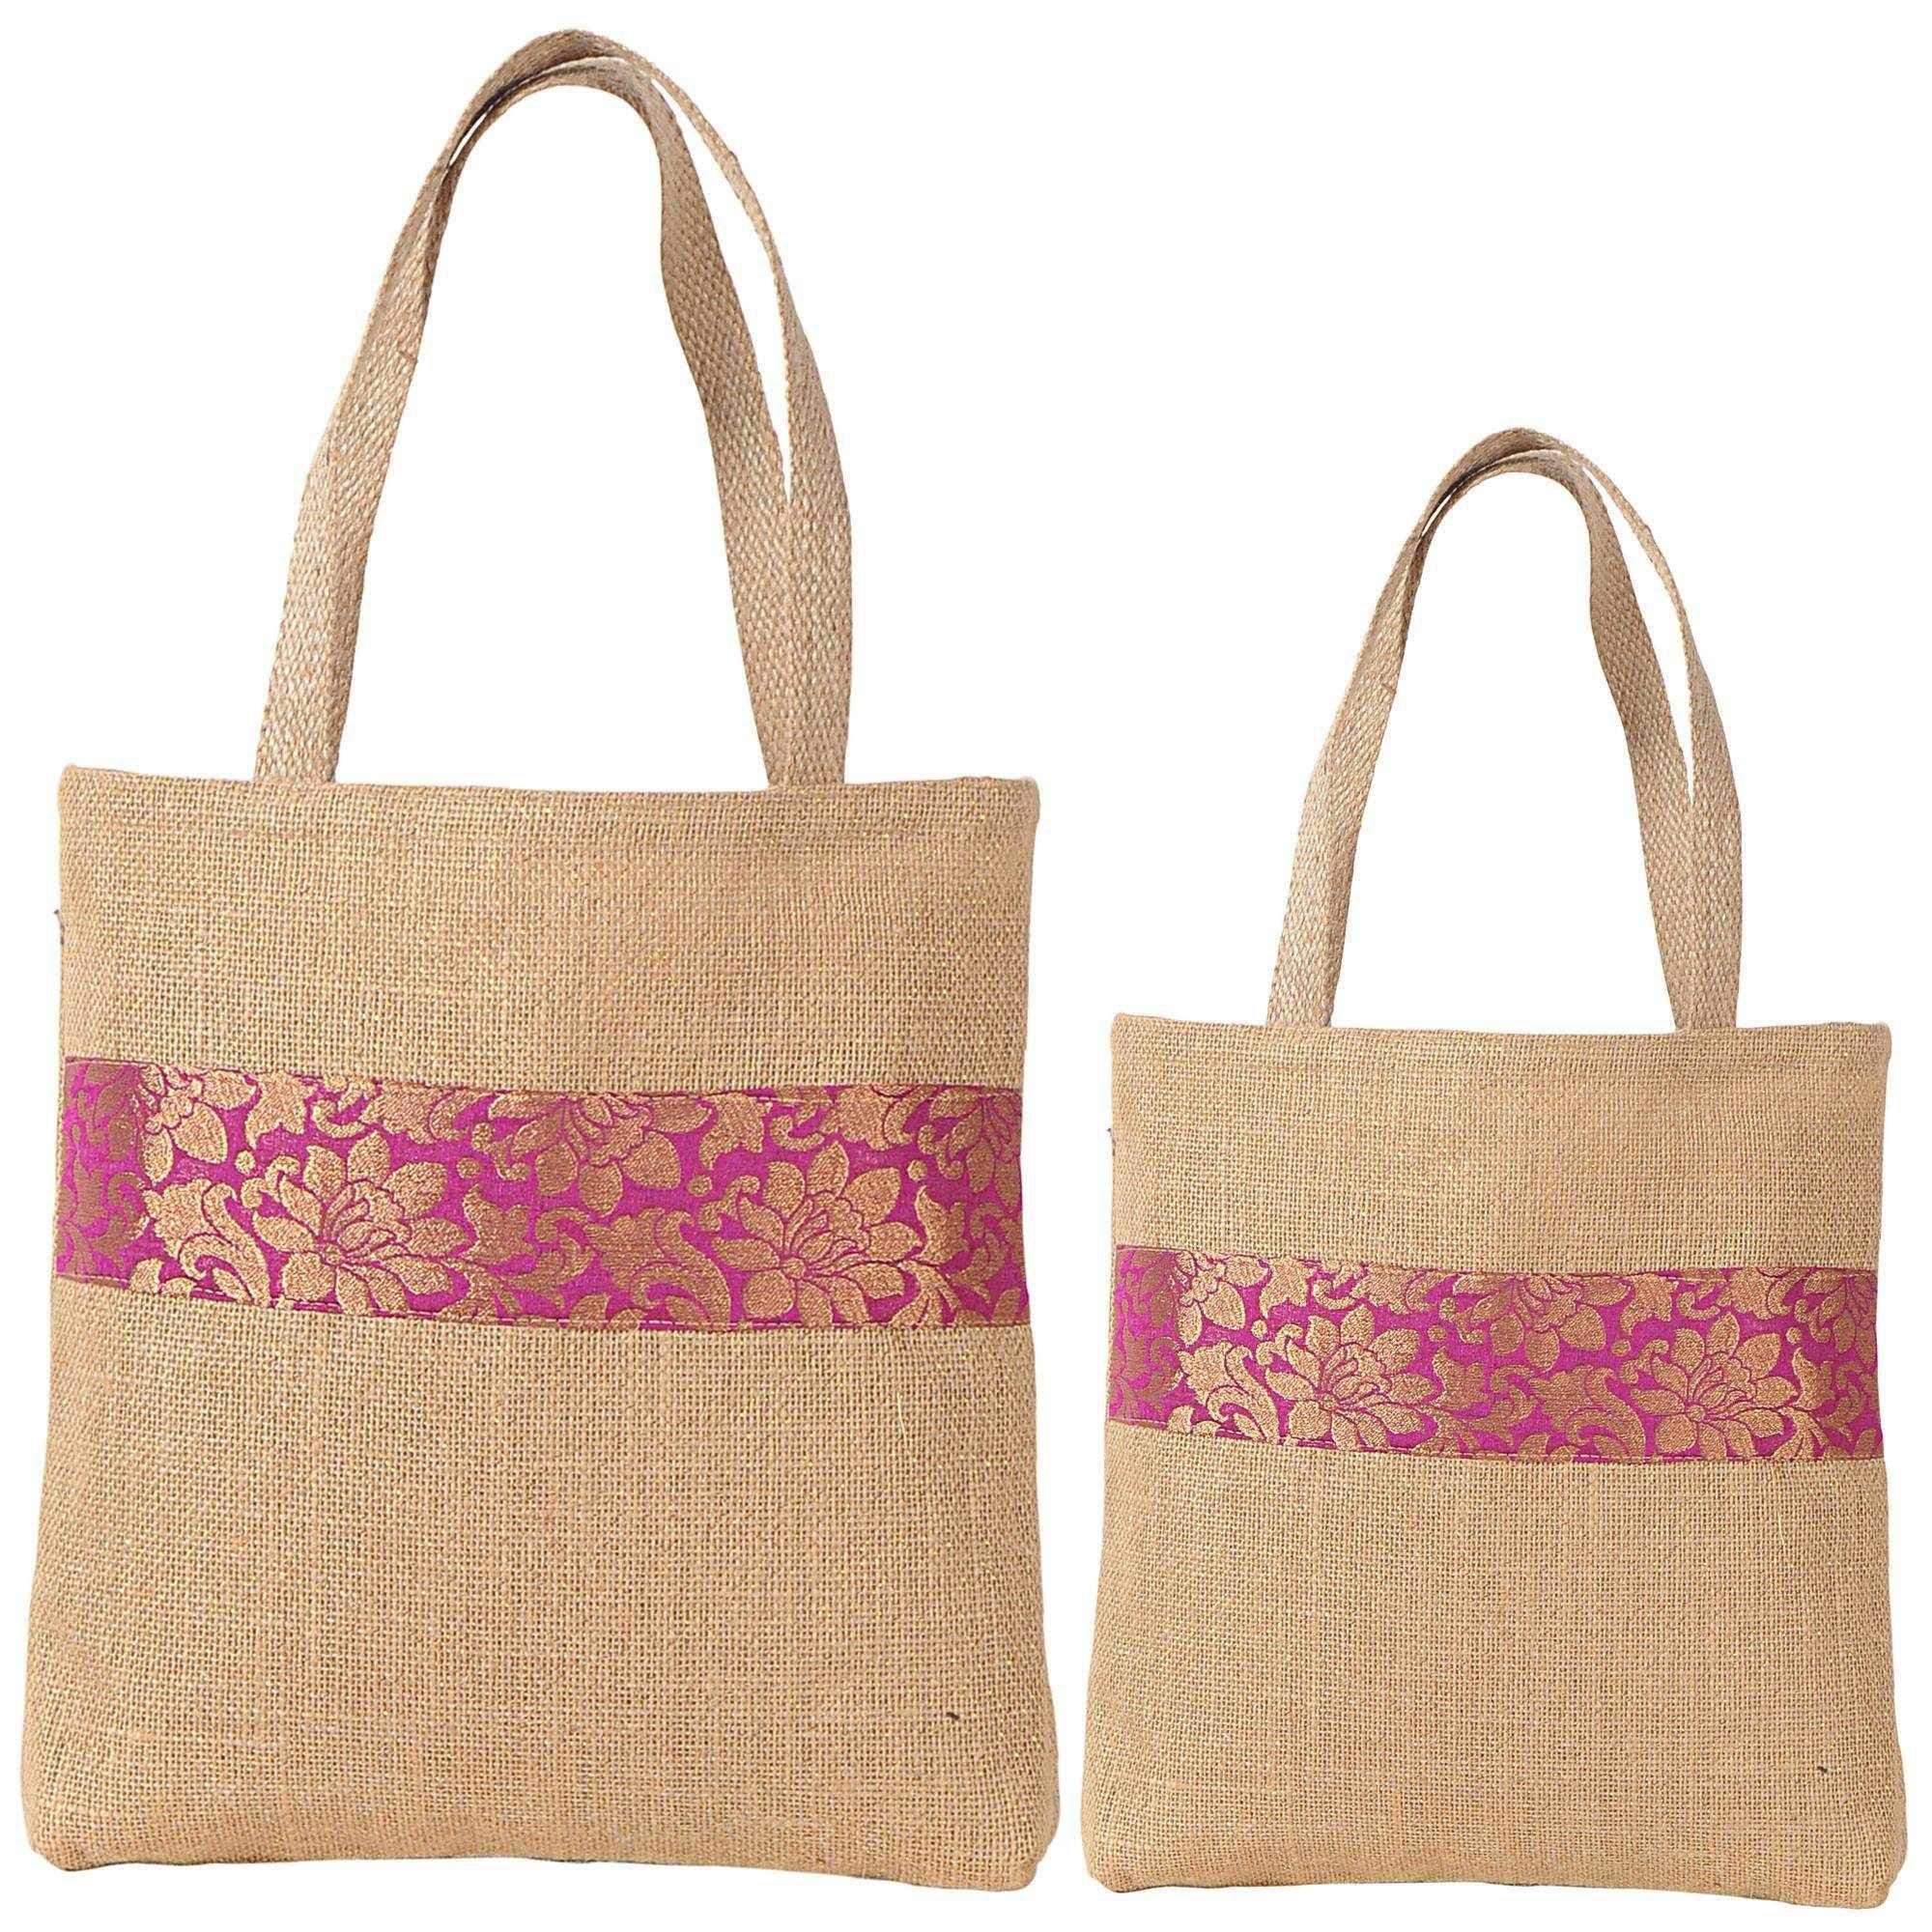 ShalinIndia - Set Of 2 Multipurpose Shopping Bags, Jute Shimmer,Natural Fiber-Eco Frienly,Non Woven Lining